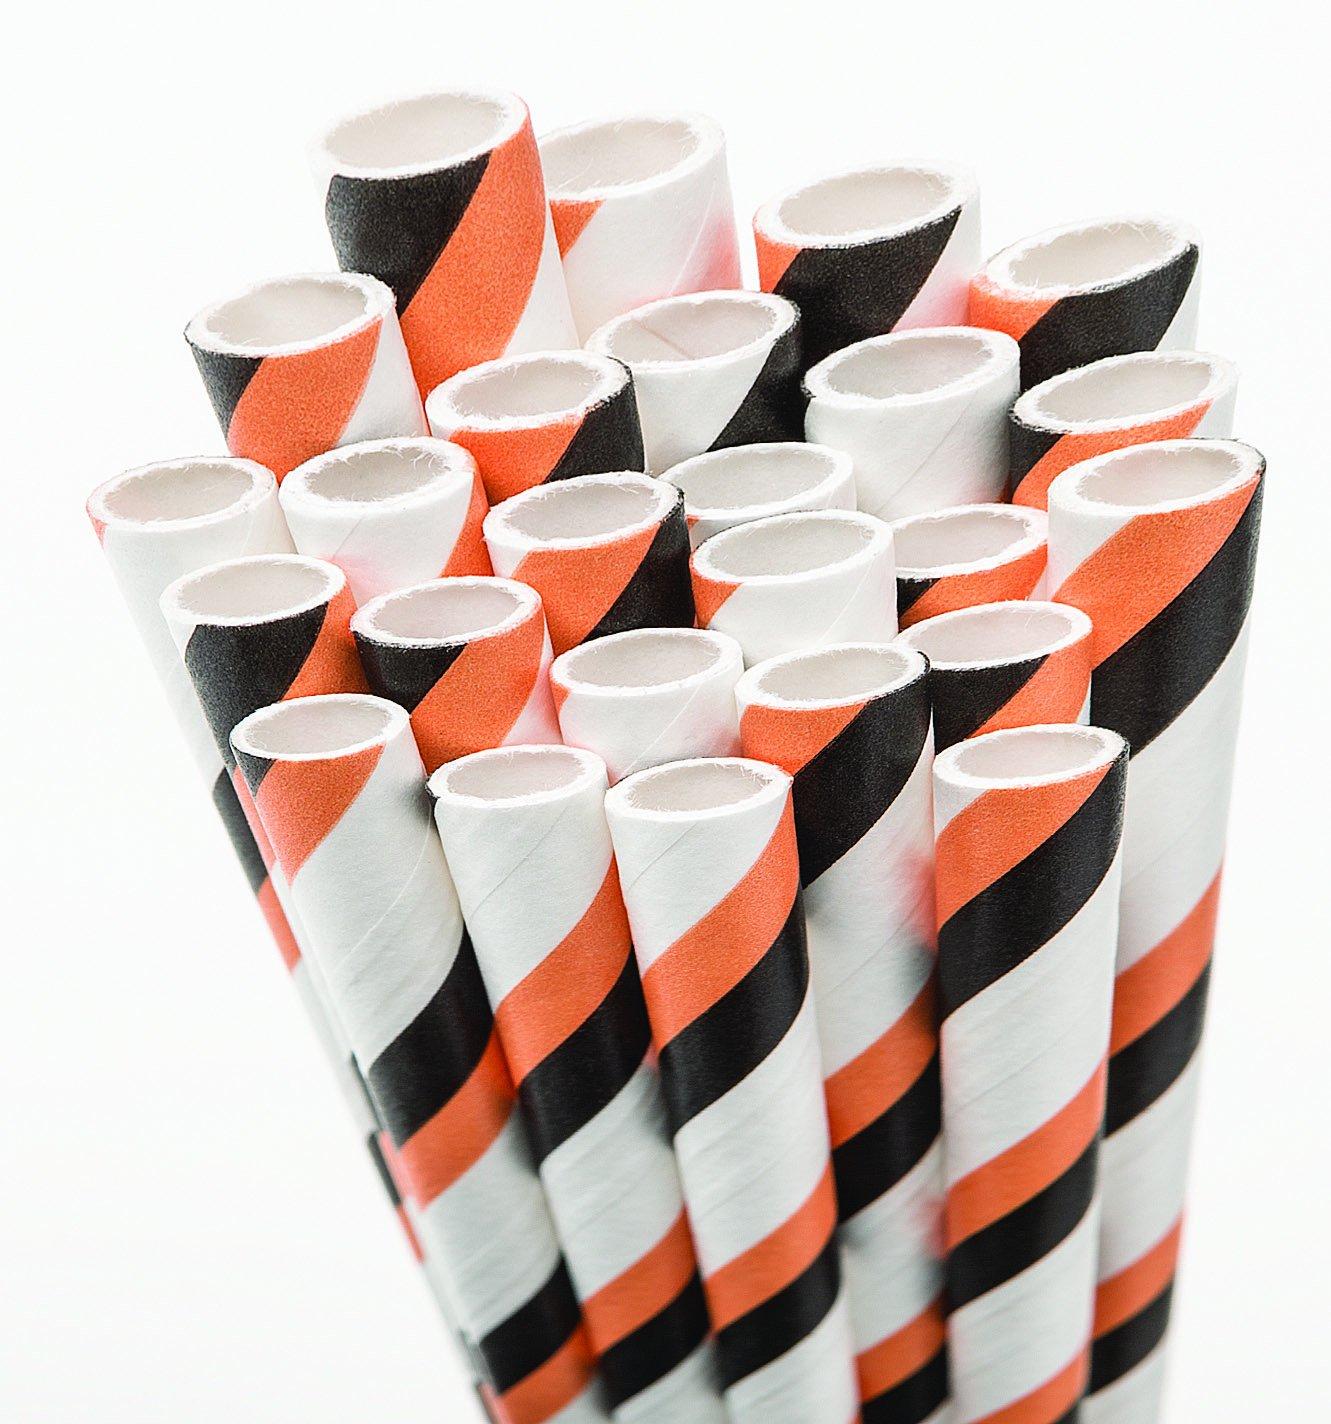 Aardvark 61520039 Paper Drinking Straw, 7/32'' Diameter x 7-3/4'' Length, Pumpkin Orange and Jet Black Stripe (8 Boxes of 600)